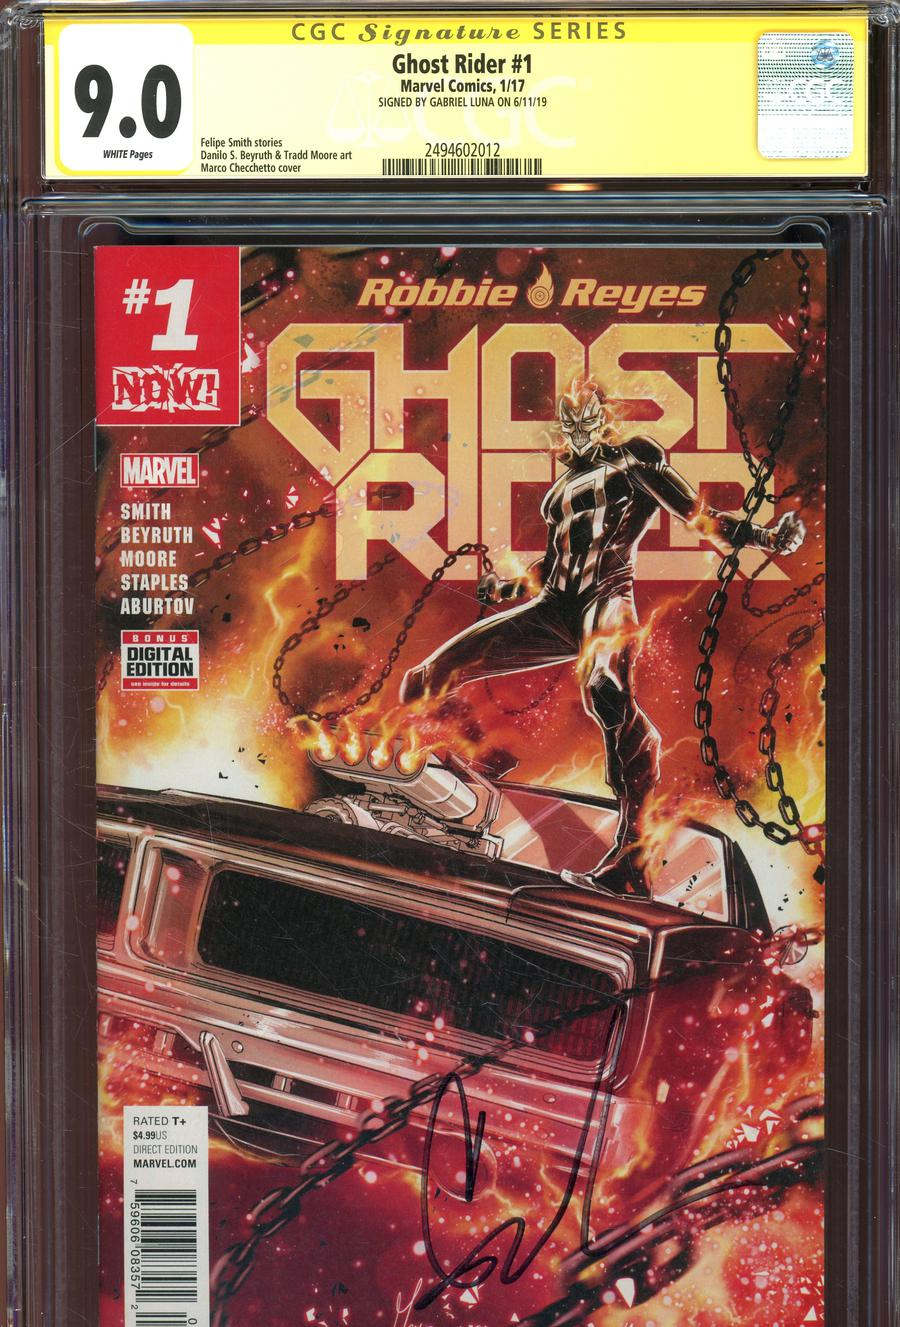 Ghost Rider Vol 7 #1 Cover J Regular Marco Checchetto Cover Signed By Gabrielle Luna CGC 9.0